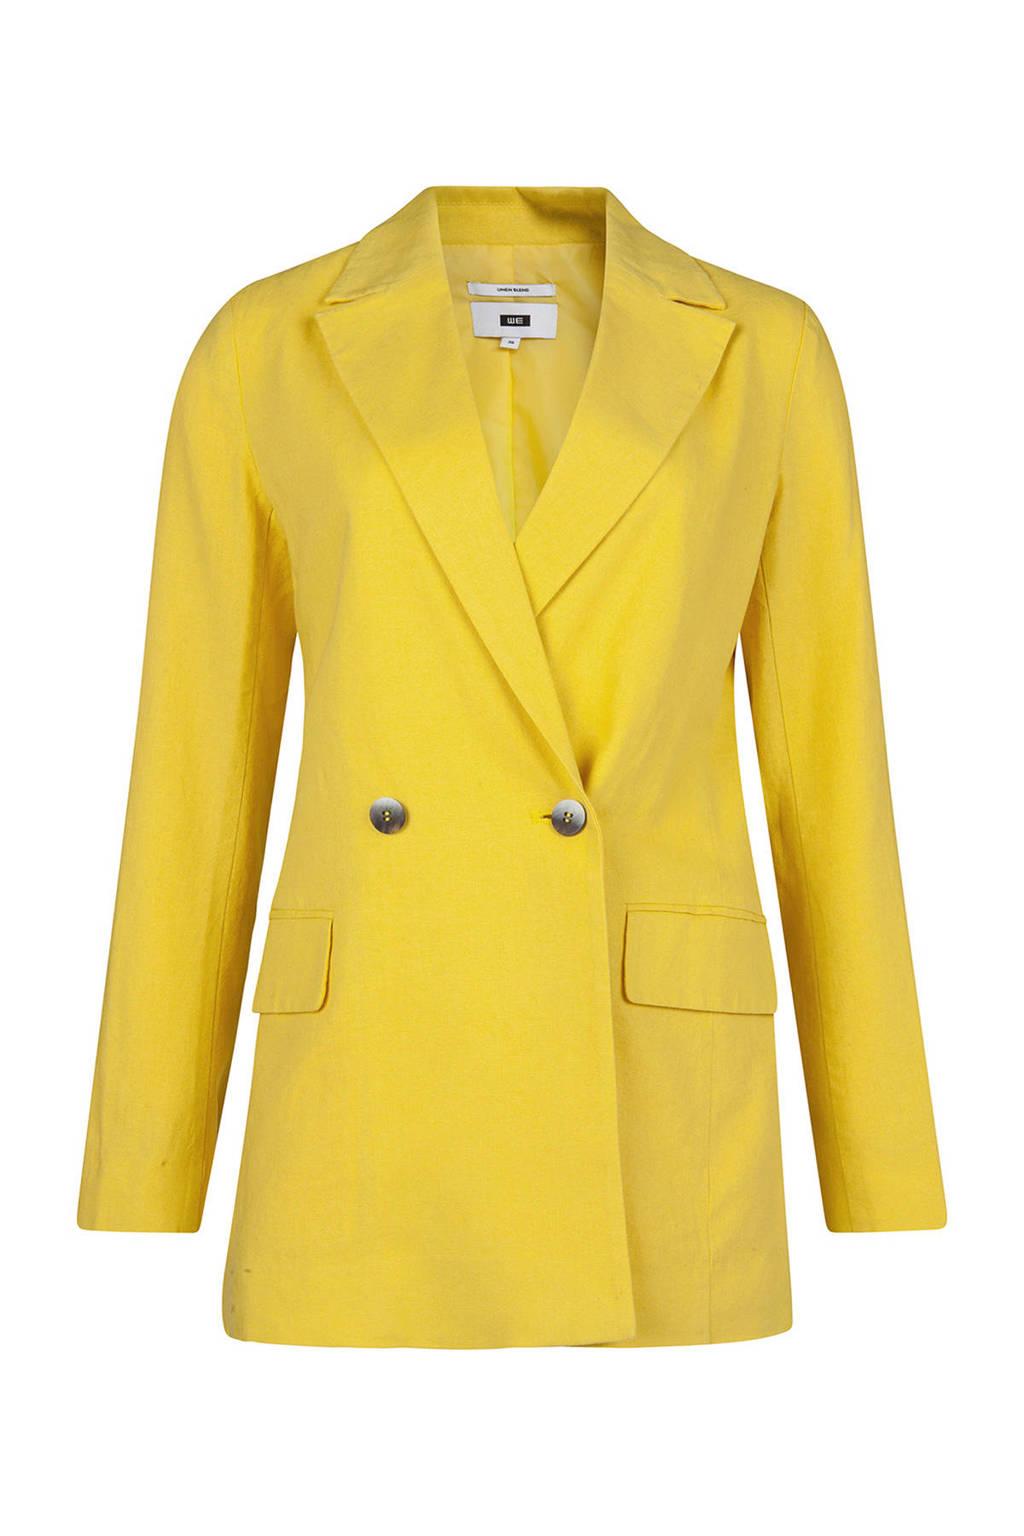 WE Fashion blazer met linnen geel, Geel